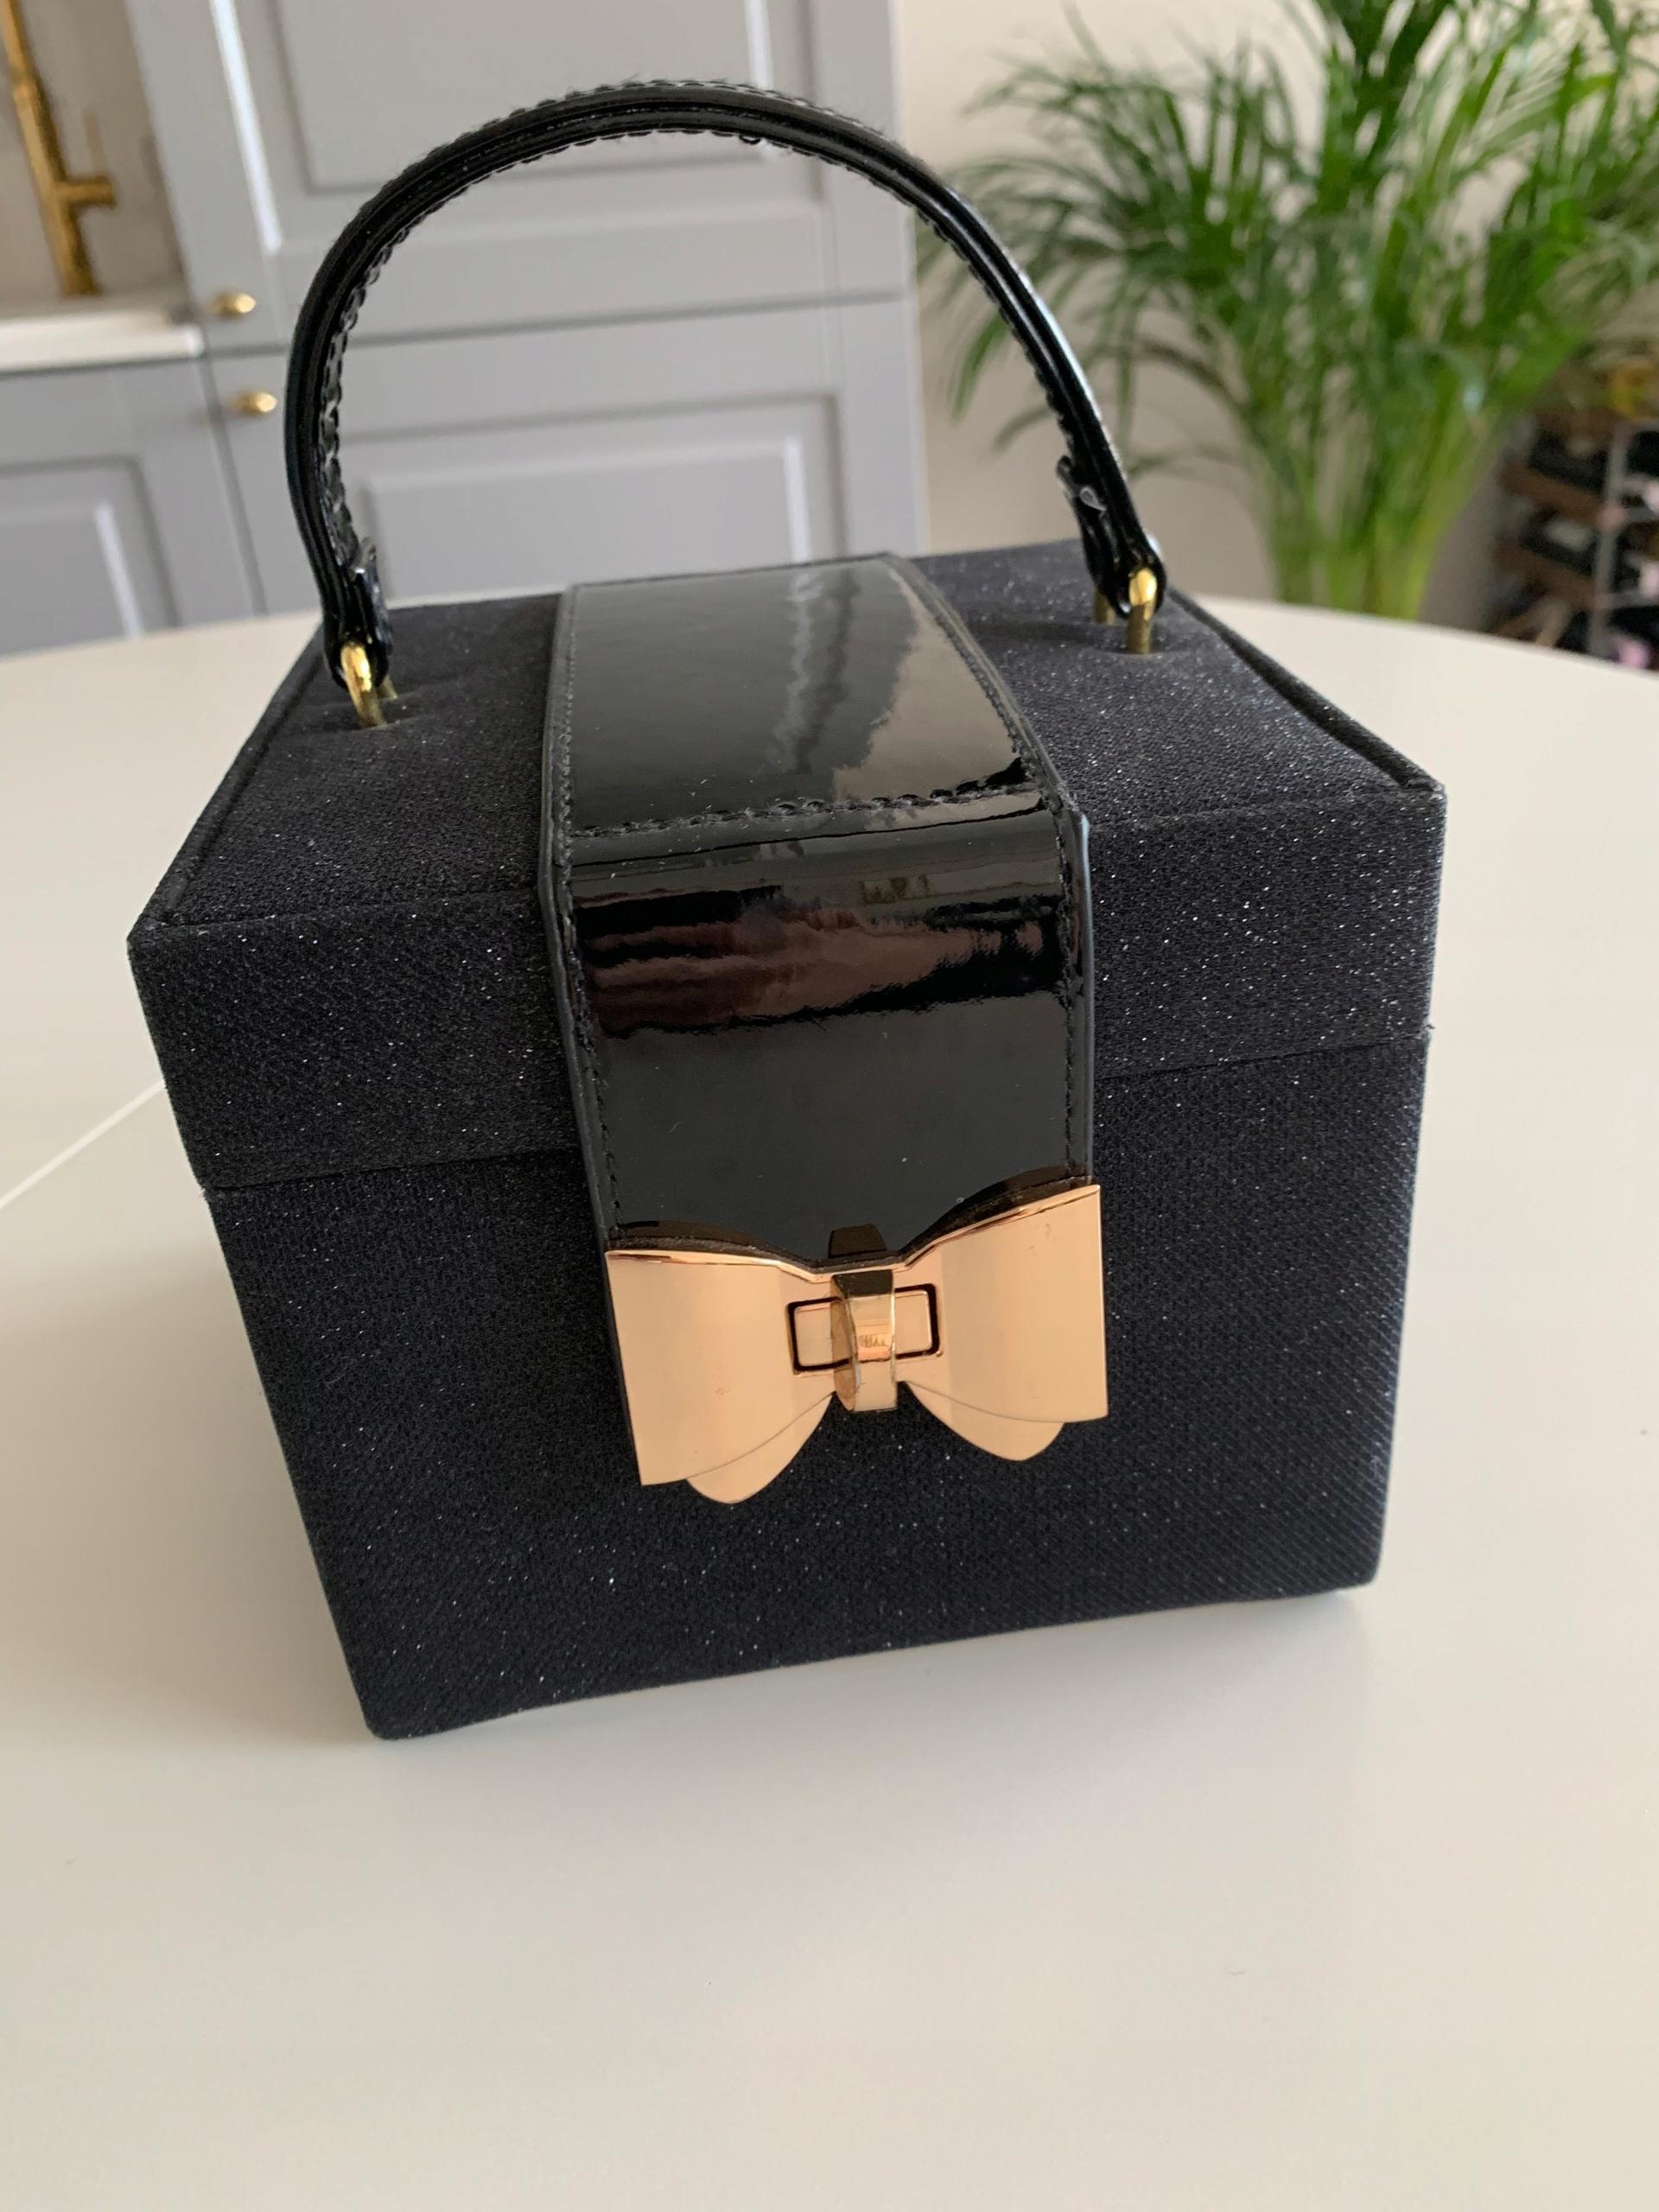 Pudełko na biżuterię Home&You